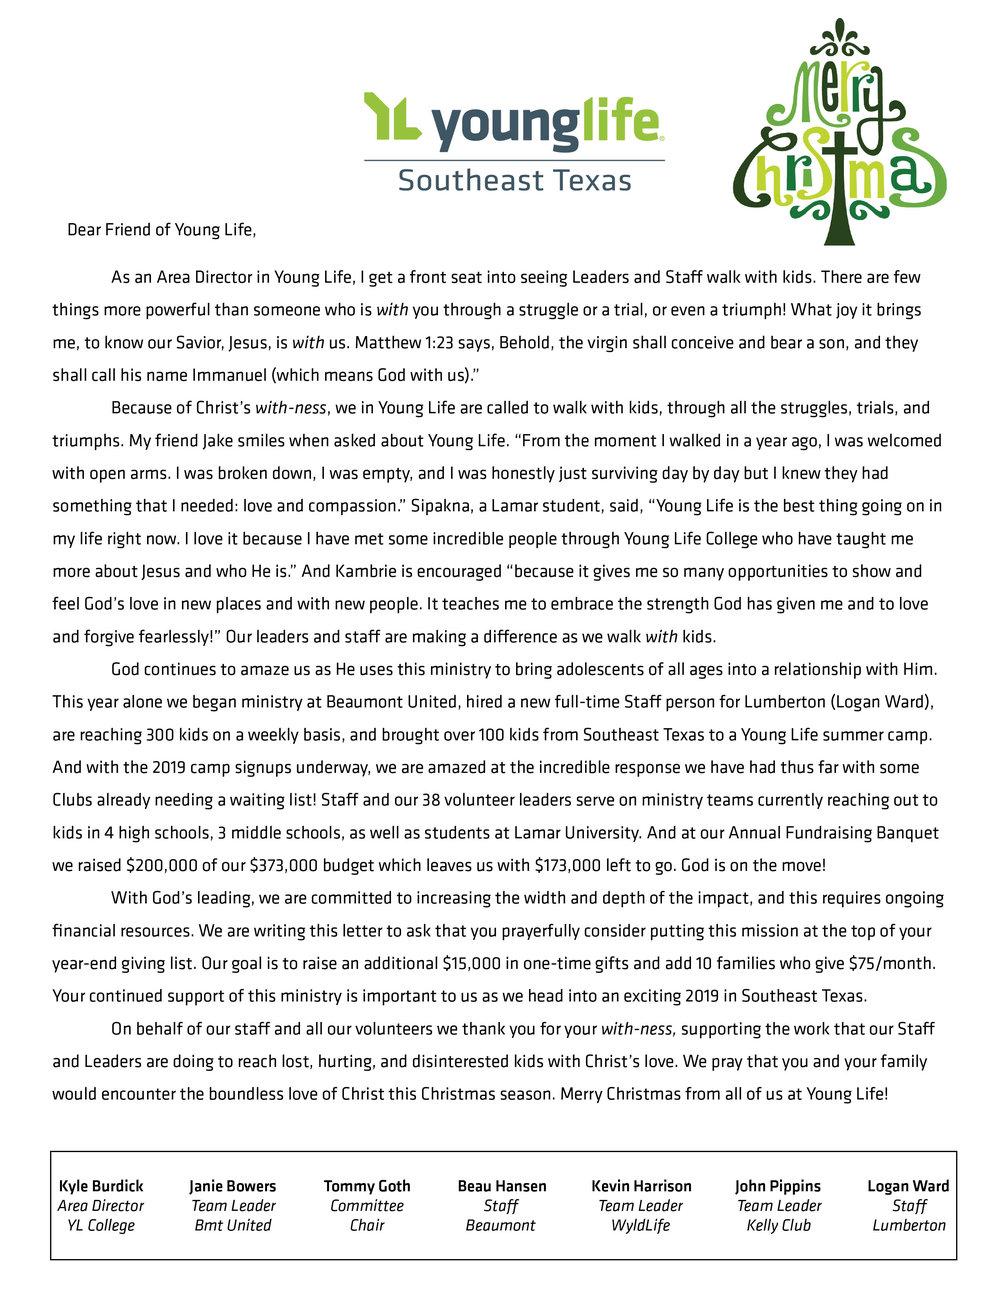 Year End Letter 2018.jpg